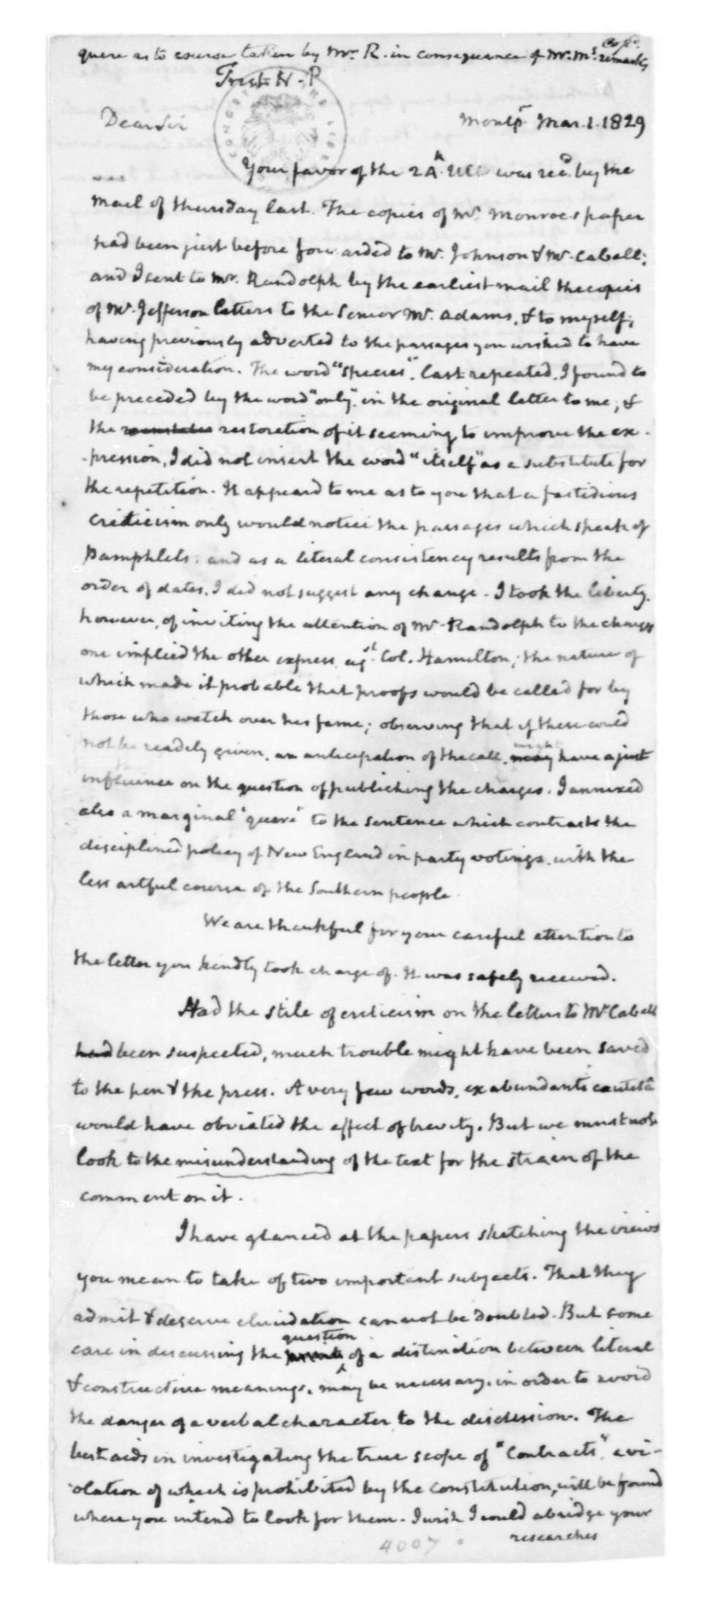 James Madison to Nicholas P. Trist, March 1, 1829.